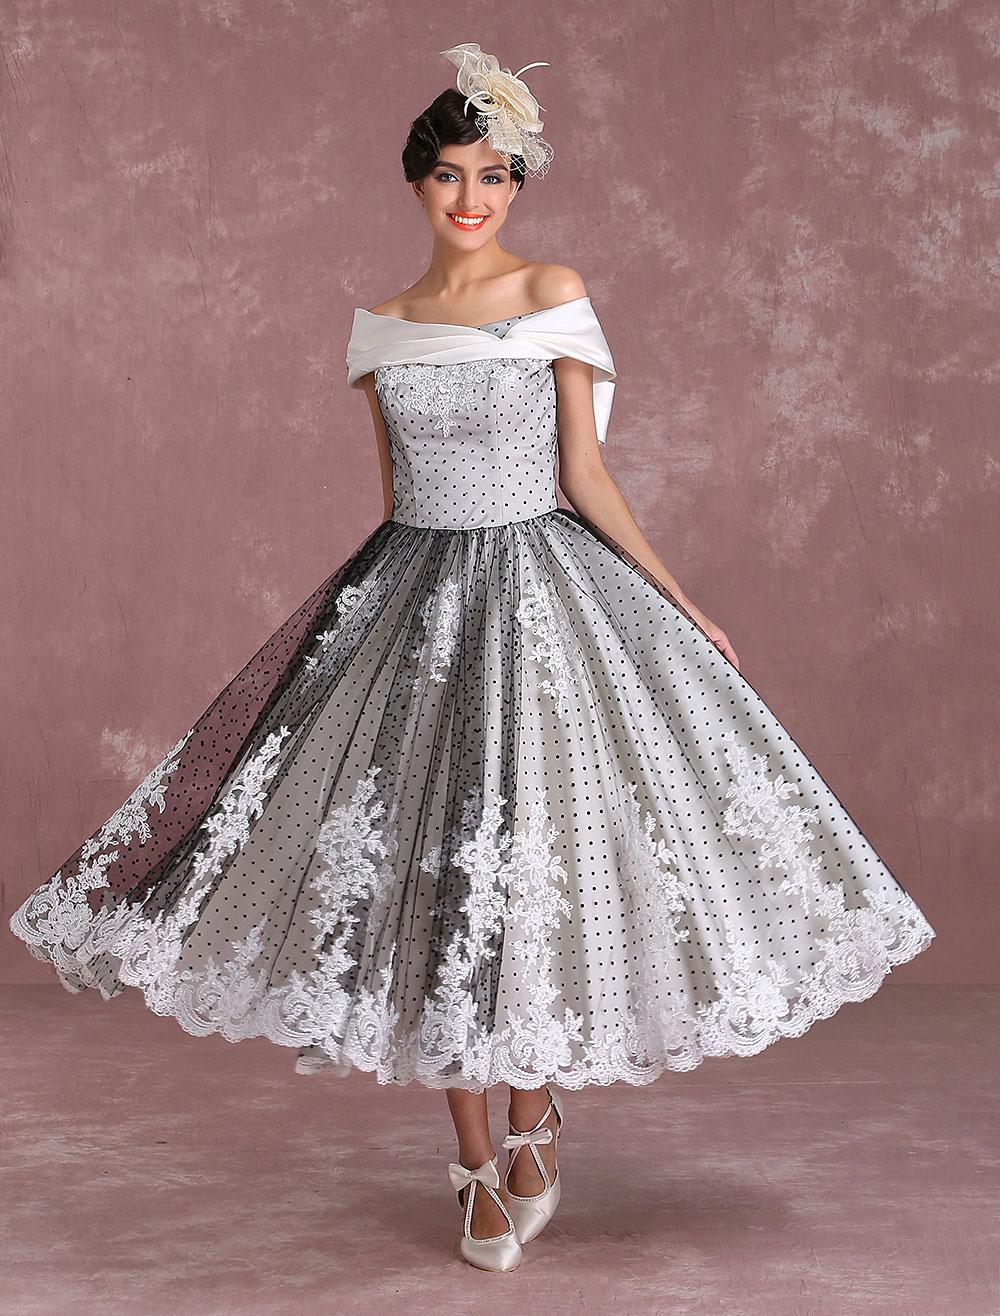 Vintage Wedding Dresses Black Short Bridal Gown Lace Off The Shoulder Polka Dot Print Bridal Dress With Bow At Back Milanoo photo